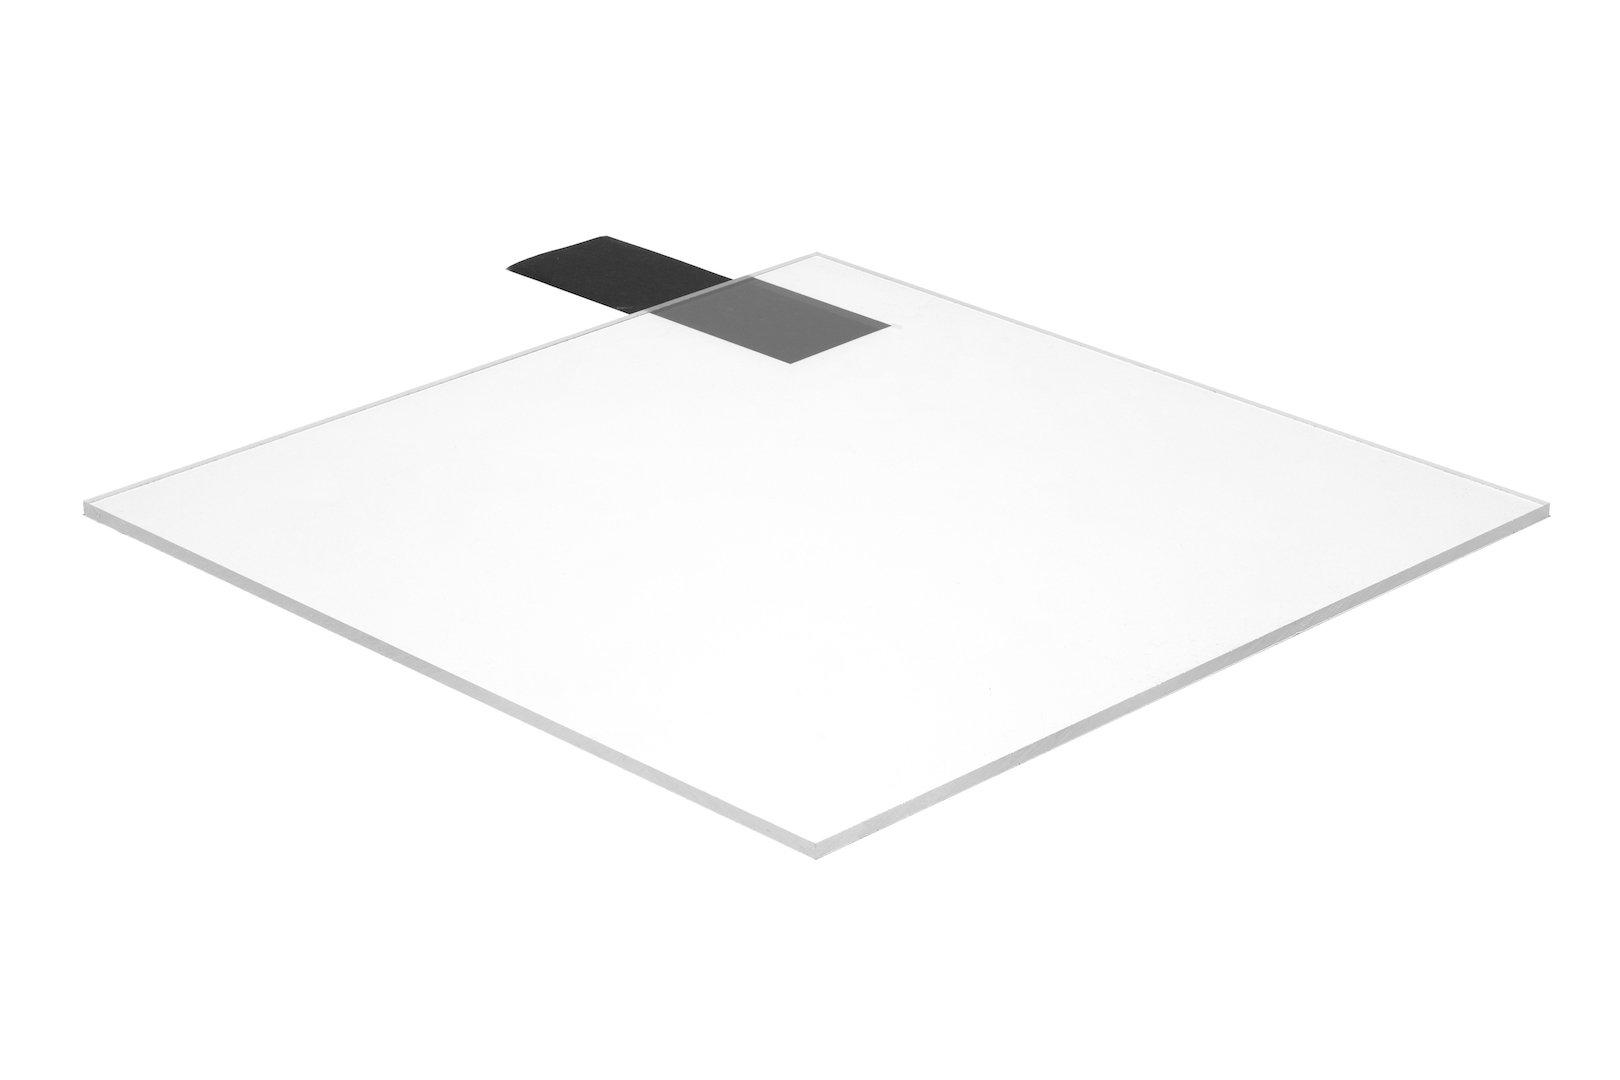 Falken Design falkenacrylic_pc_118_24x60 Sheet, Plastic/Plexiglas/Lucite, 24'' x 60-1/8'', Polycarbonate by Falken Design Corporation